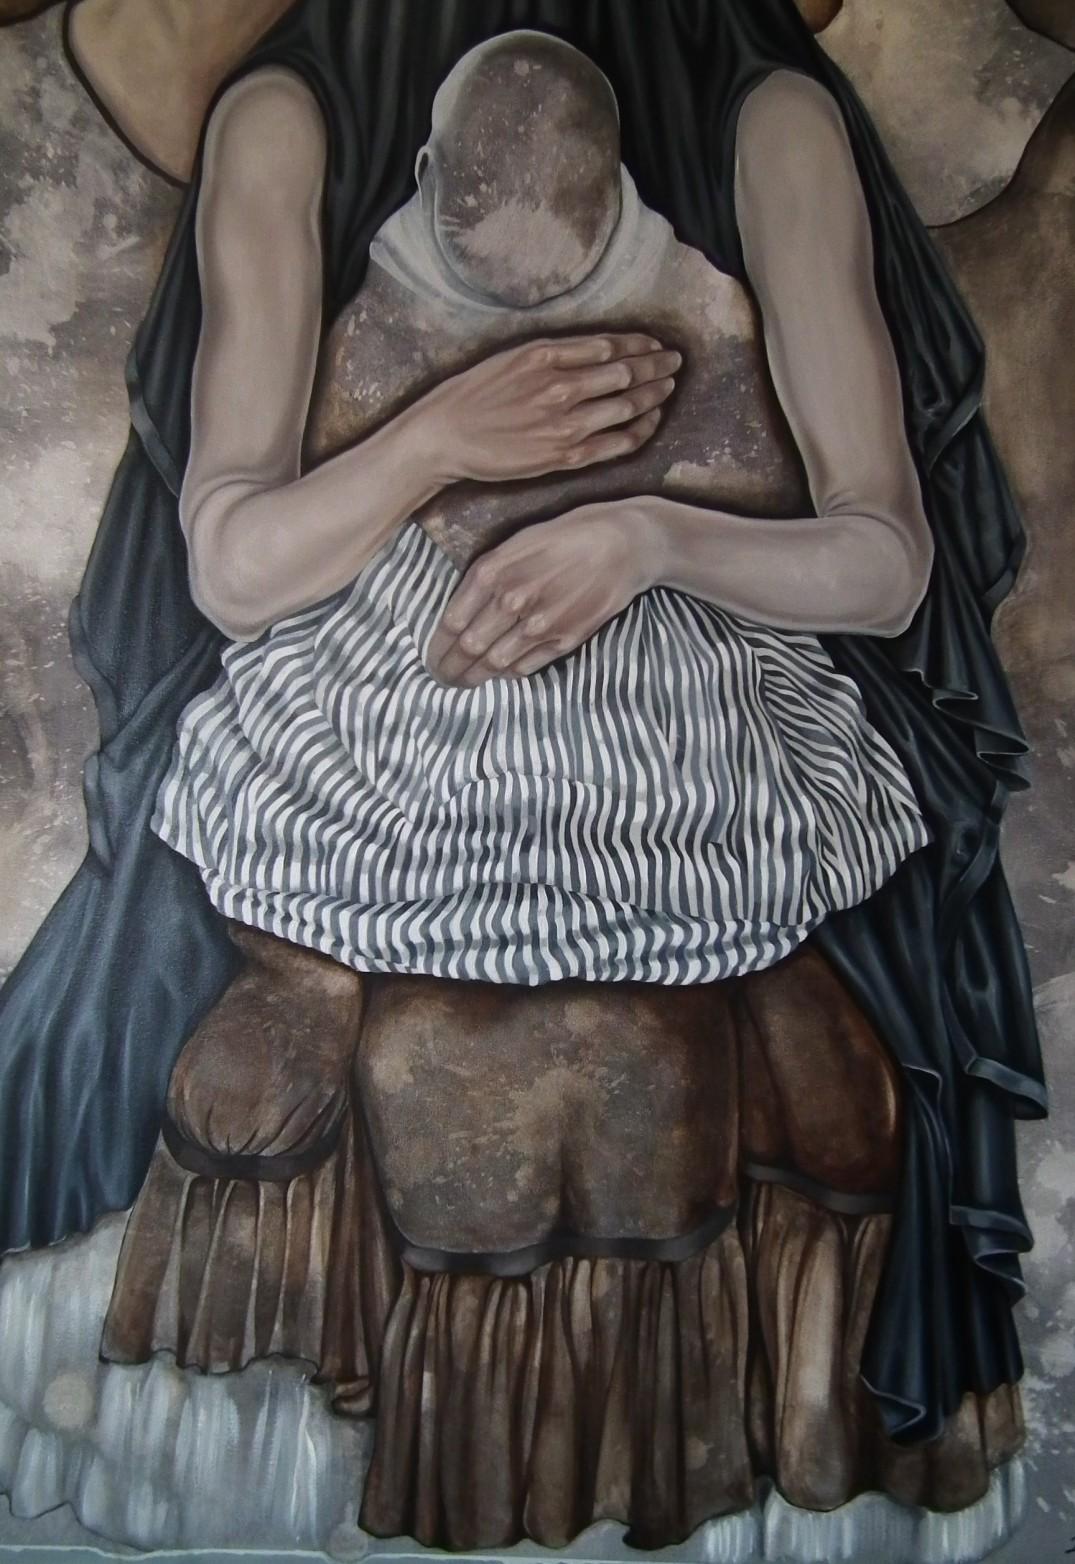 12. z cyklu Hidden children - hidden mothers, 2018, olej, płótno, 140x110 cm (fragment) kolekcja prywatna